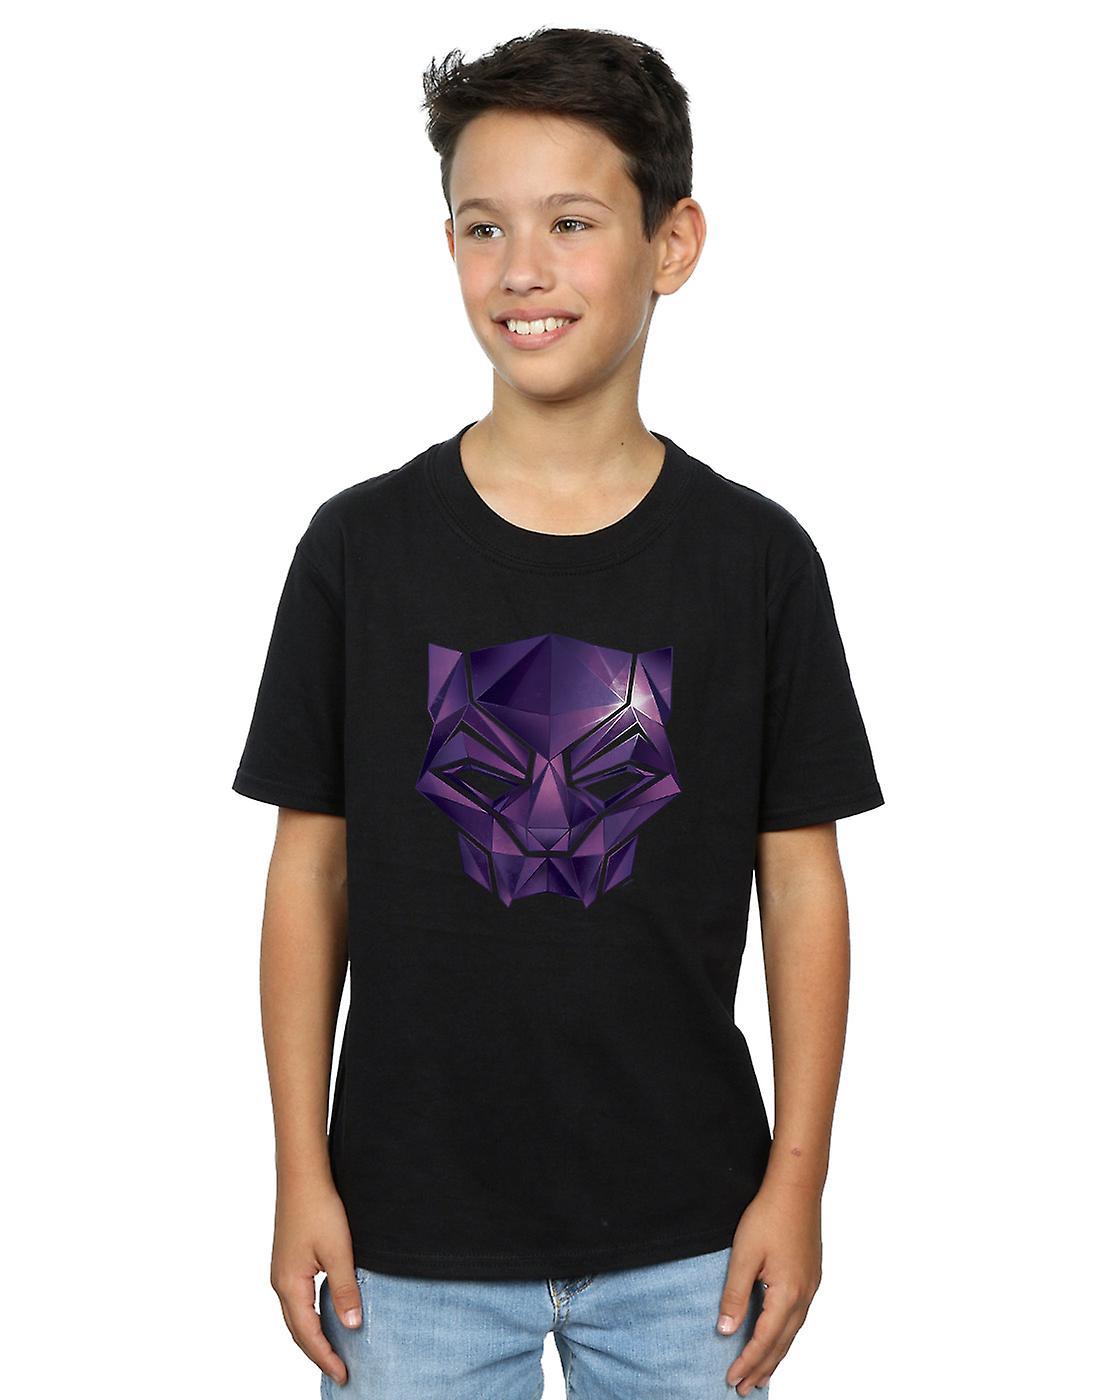 Marvel Boys Avengers Infinity War Black Panther Geometric T-Shirt